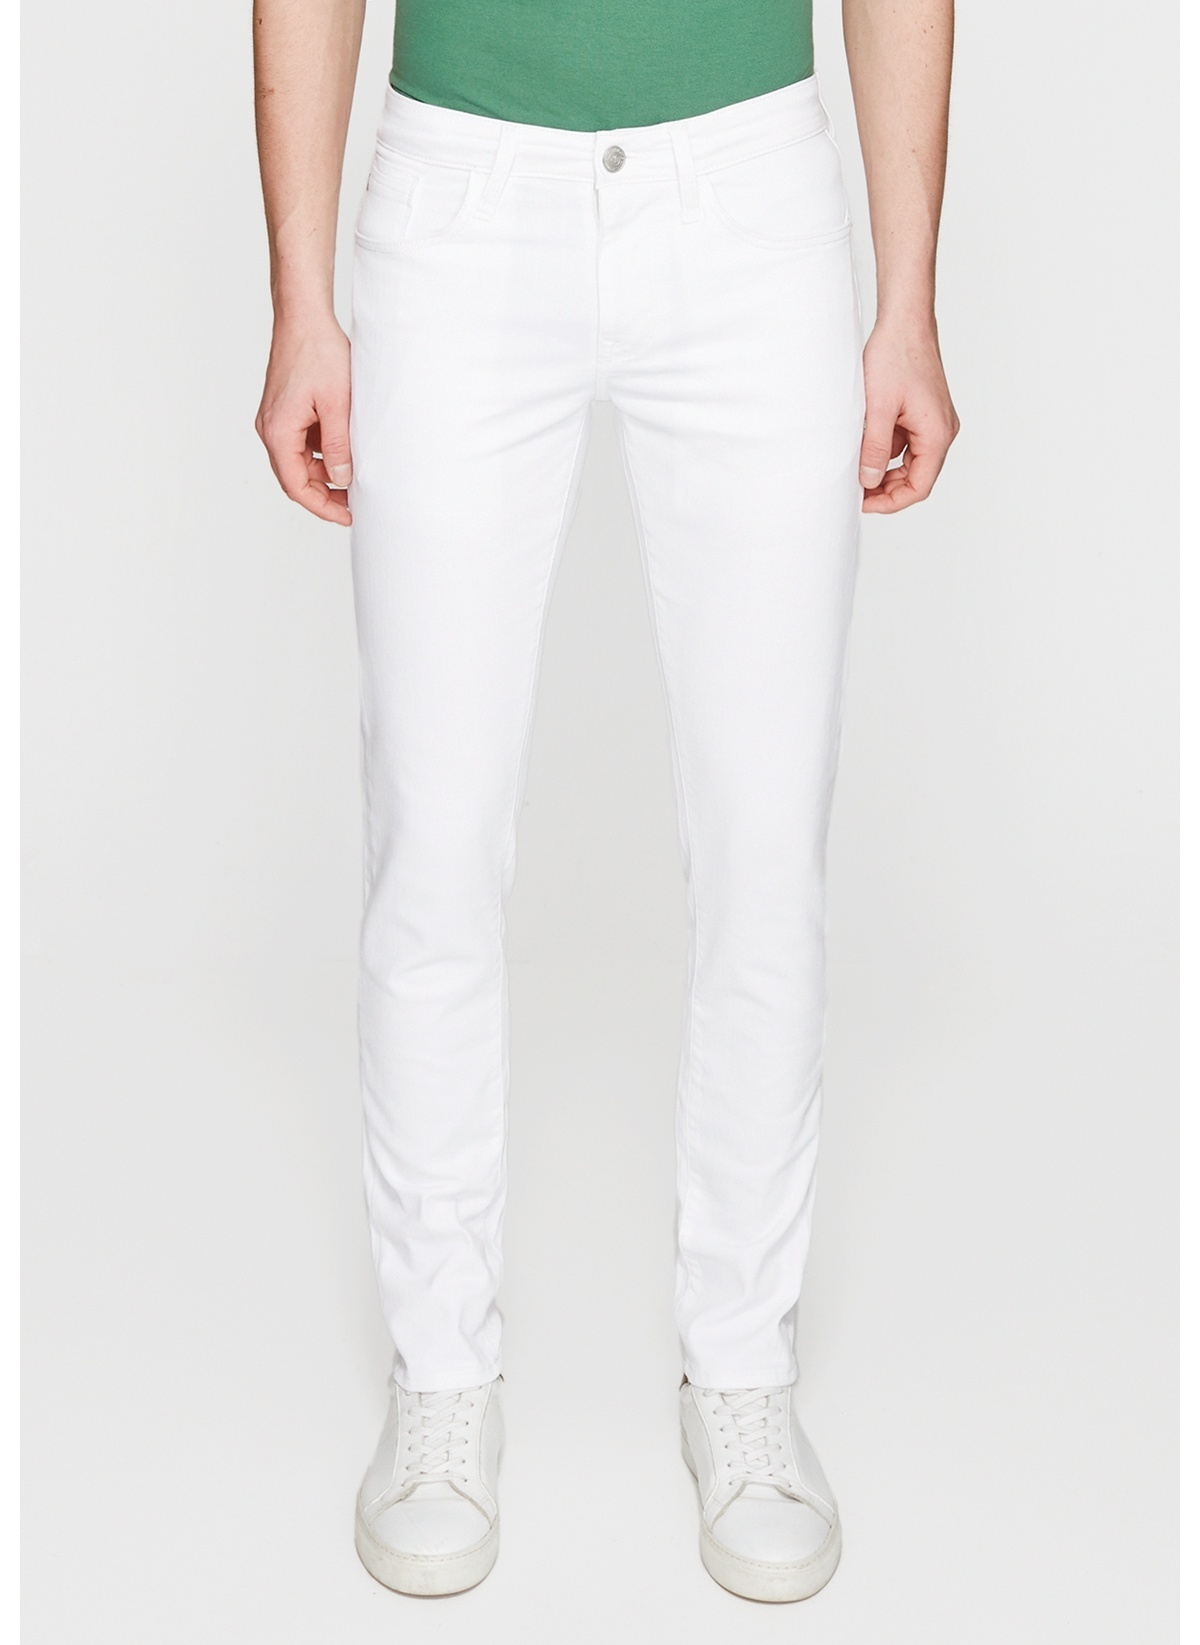 Mavi Jean Pantolon   James – Super Skinny 0042423856 James Comfort Beyaz Jean Pant – 149.99 TL